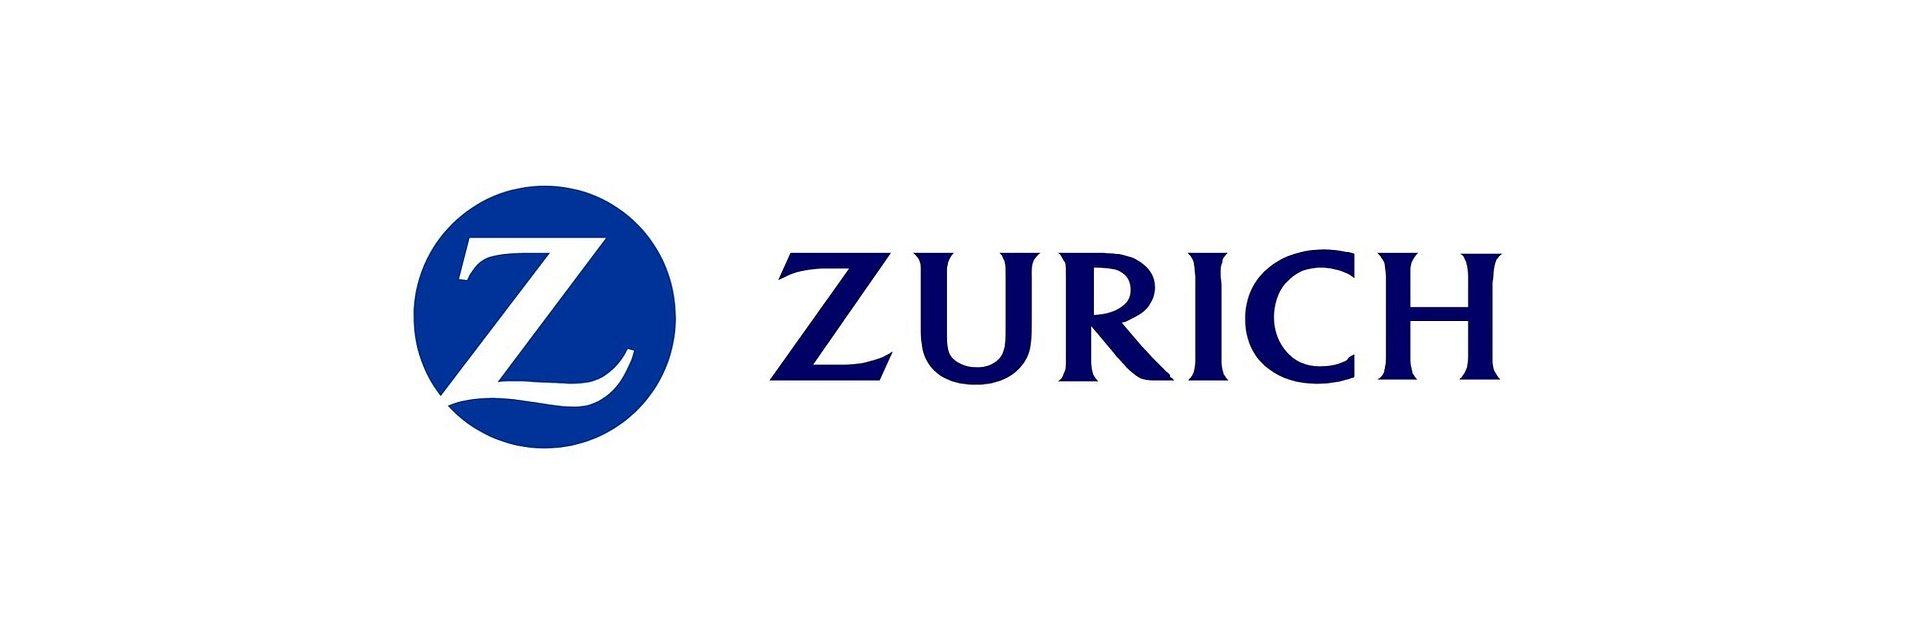 "Zurich Portugal, ""Z Zurich Foundation"" e Missão Azul doam 35 mil euros à ACREDITAR"